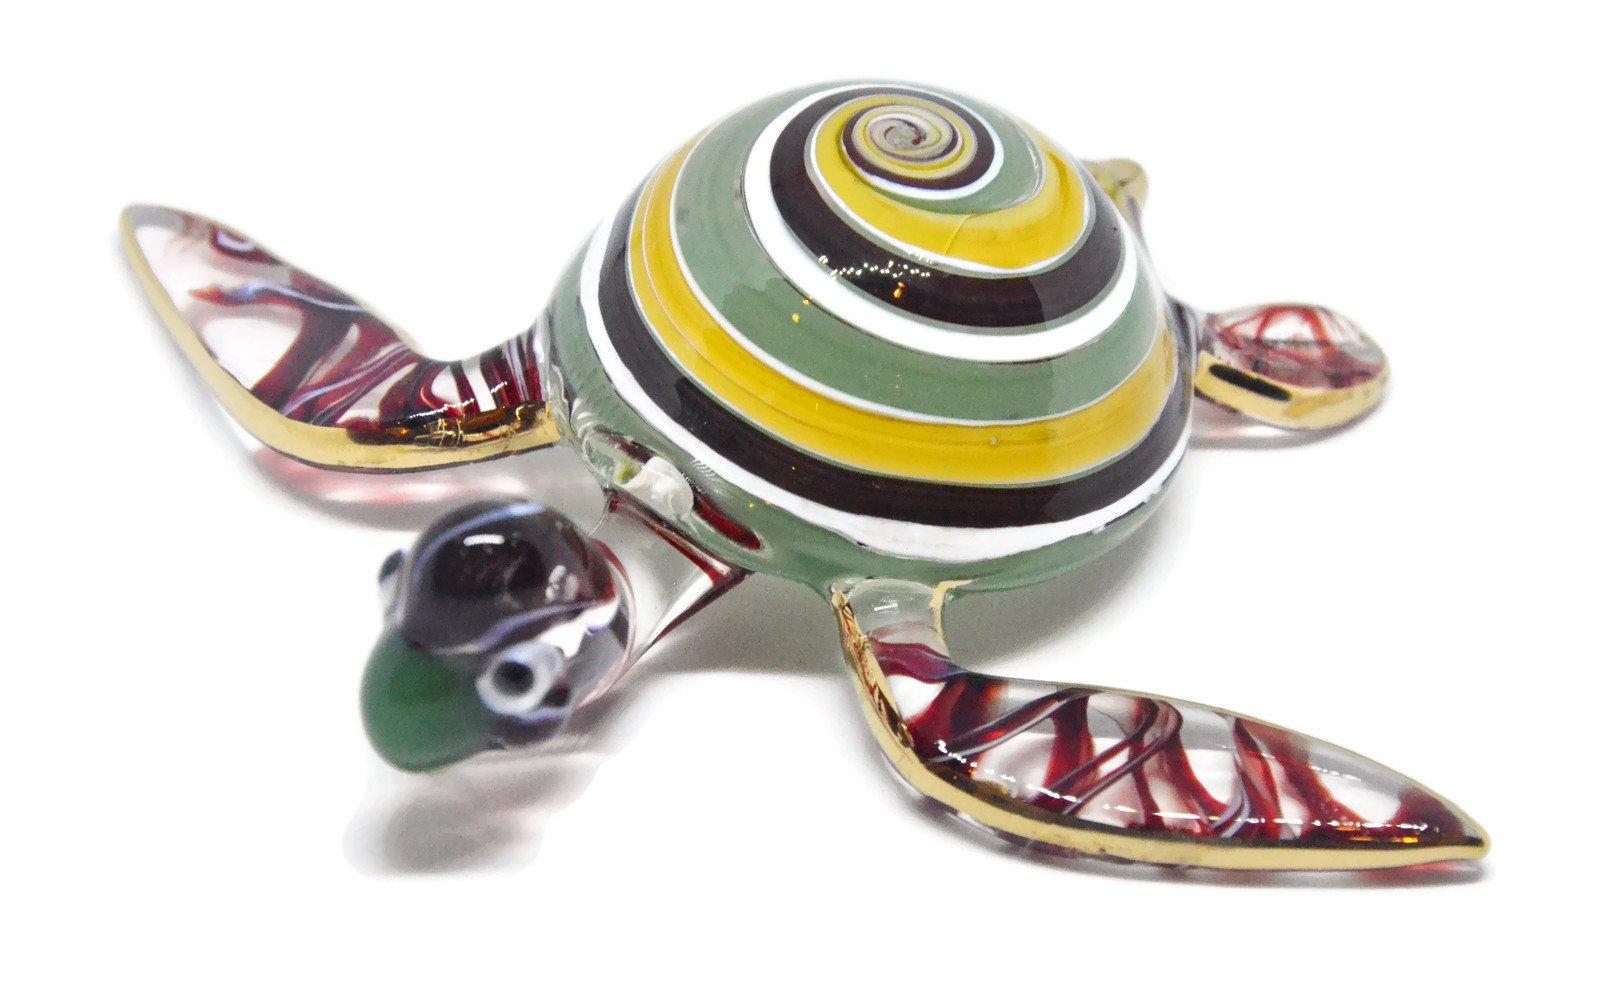 NaCraftTH Handicraft Glass Figure Murano Glass Blowing Artwork Colorful Sea Turtle Animal Figurines Fish Tank Aquarium Decorations